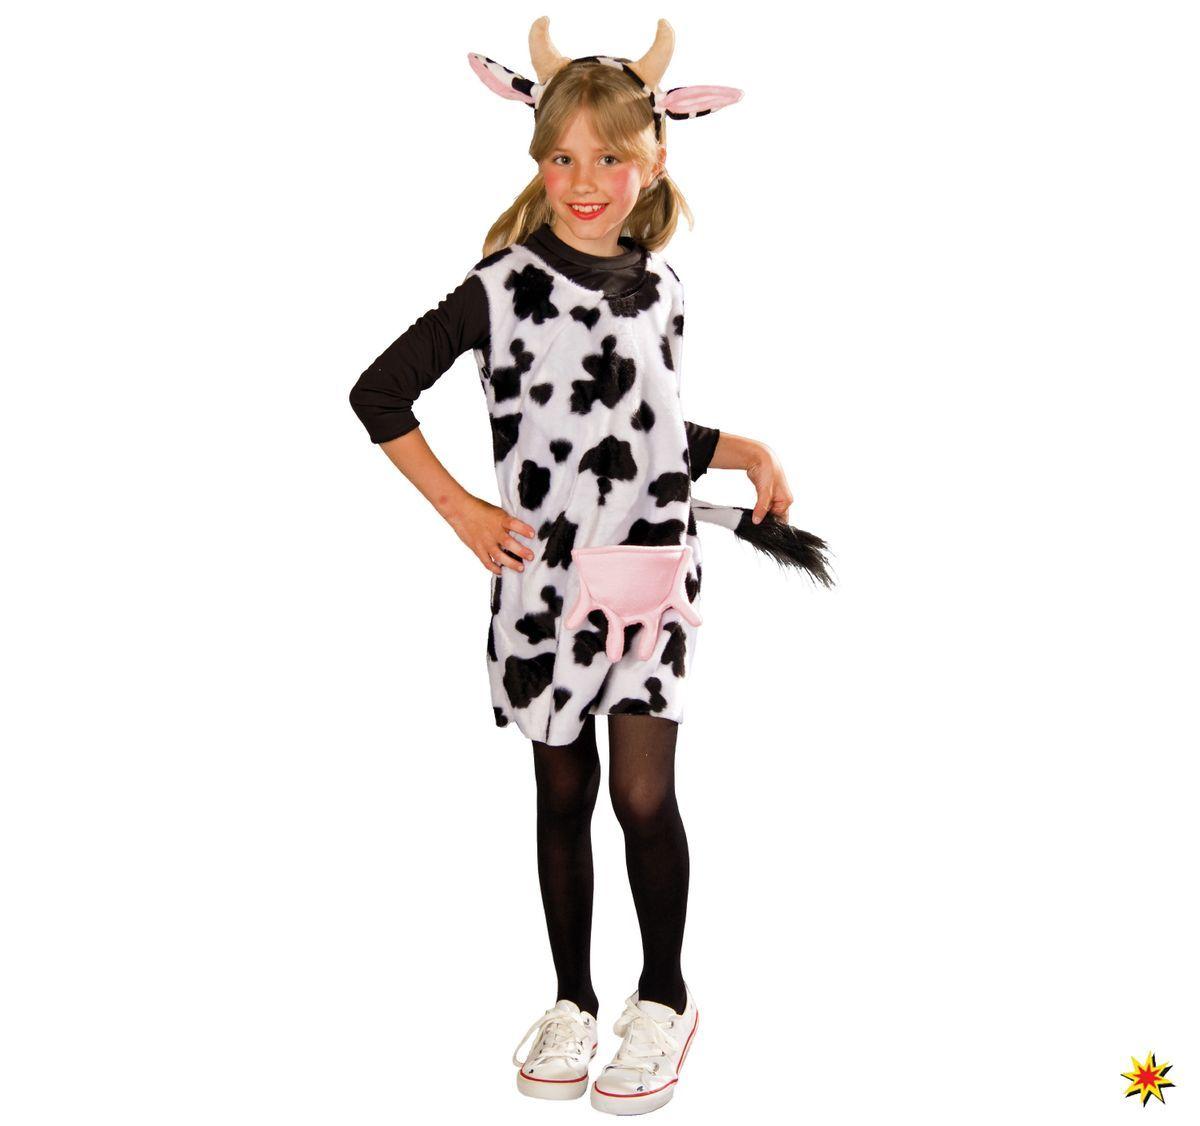 Kinder Kostüm Kuh Annabel in 2020 | Kinder kostüm ...